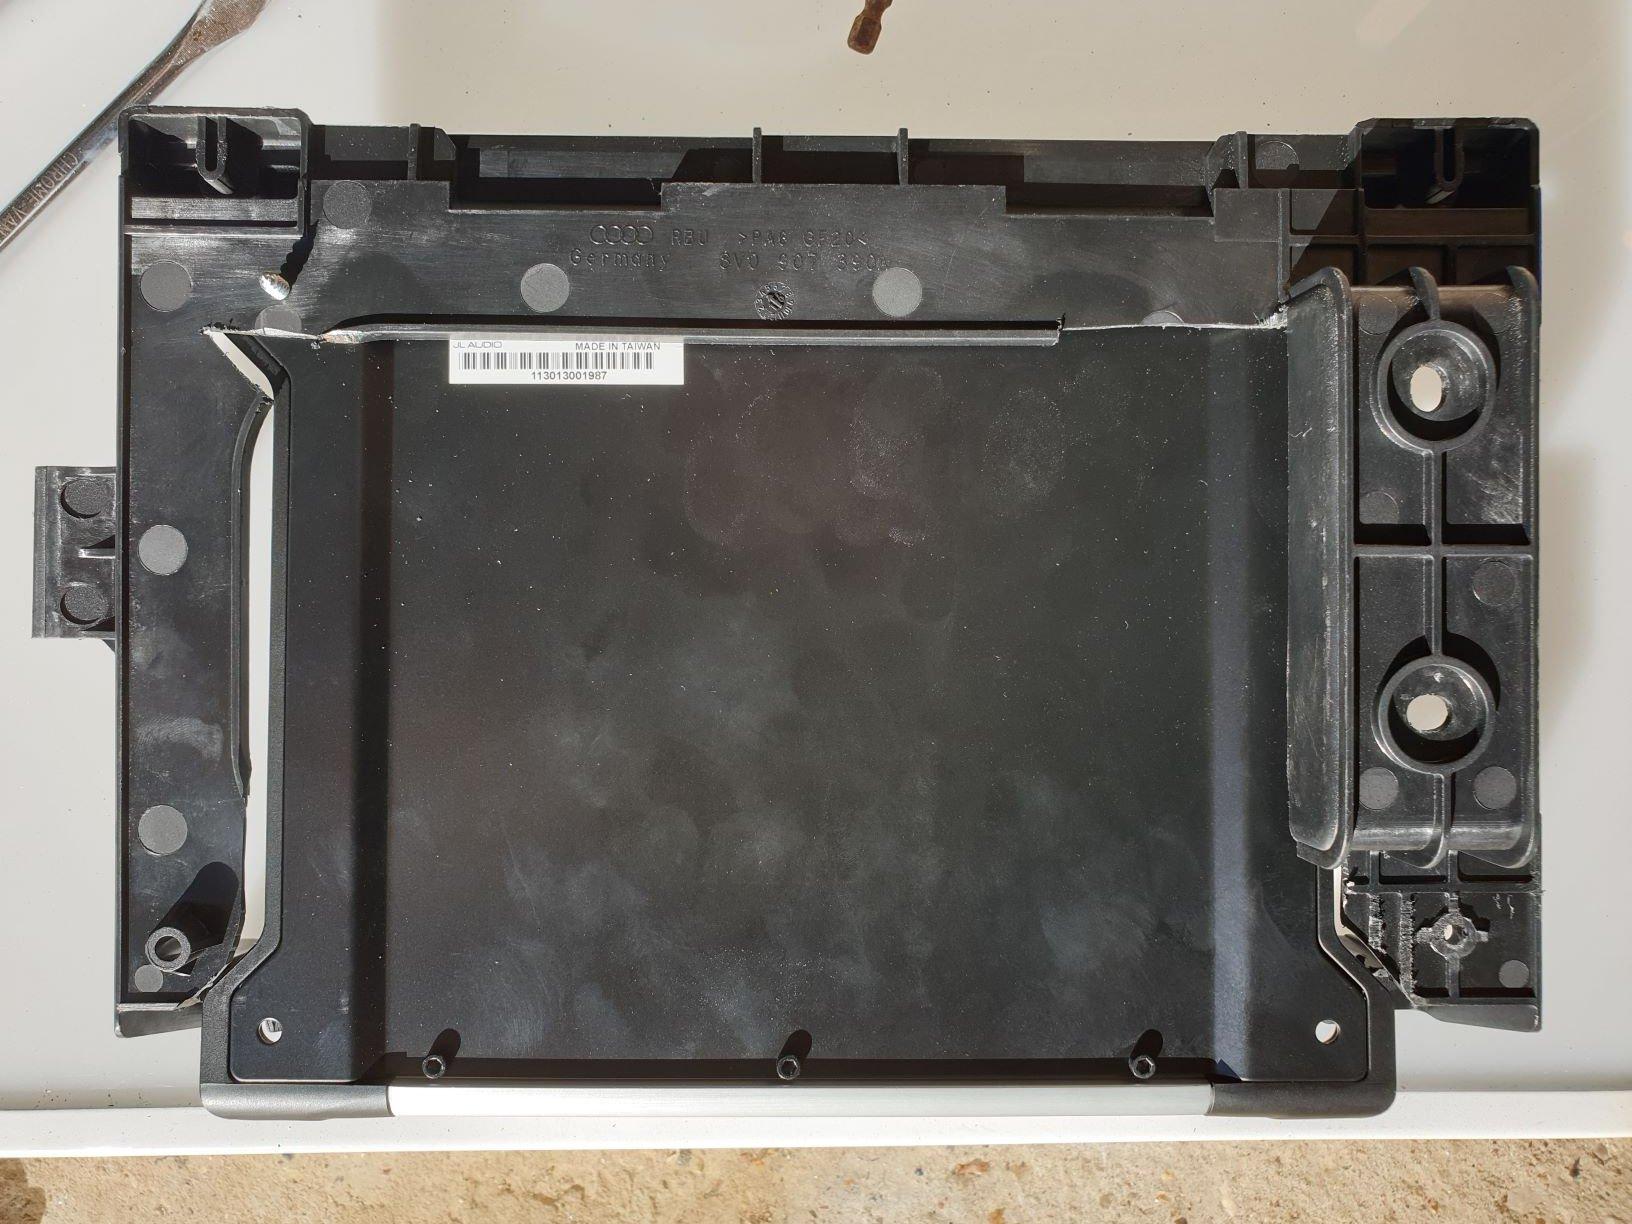 amp mounting from below.jpg